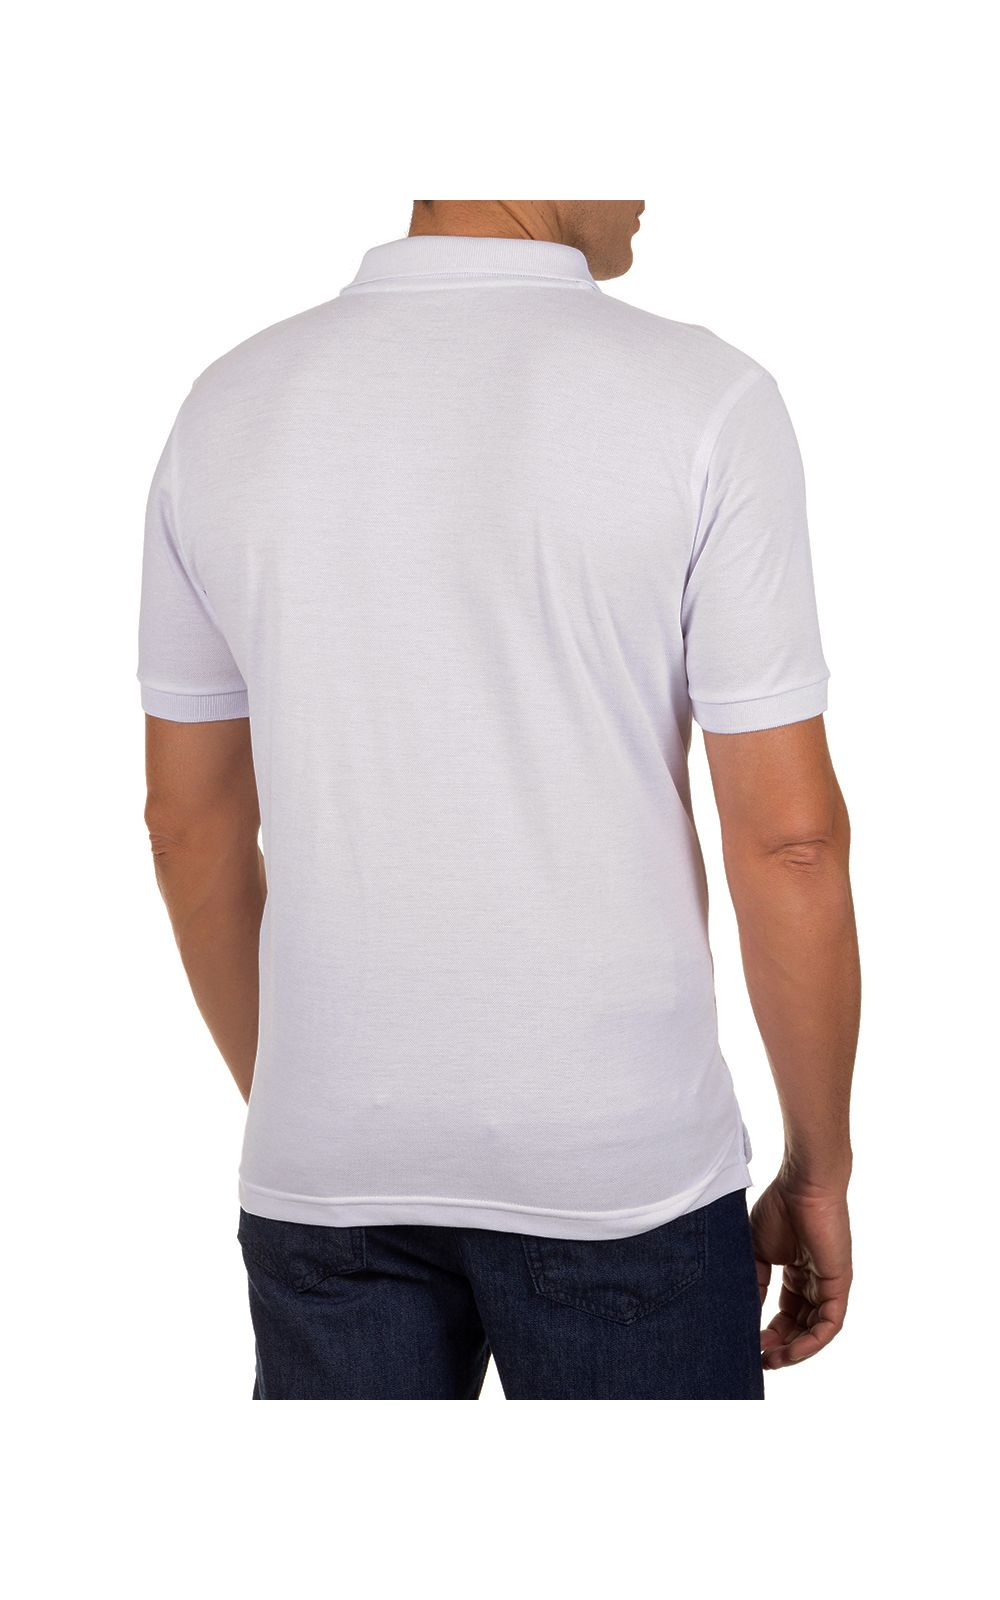 Foto 2 - Camisa Polo Masculina Branca Lisa